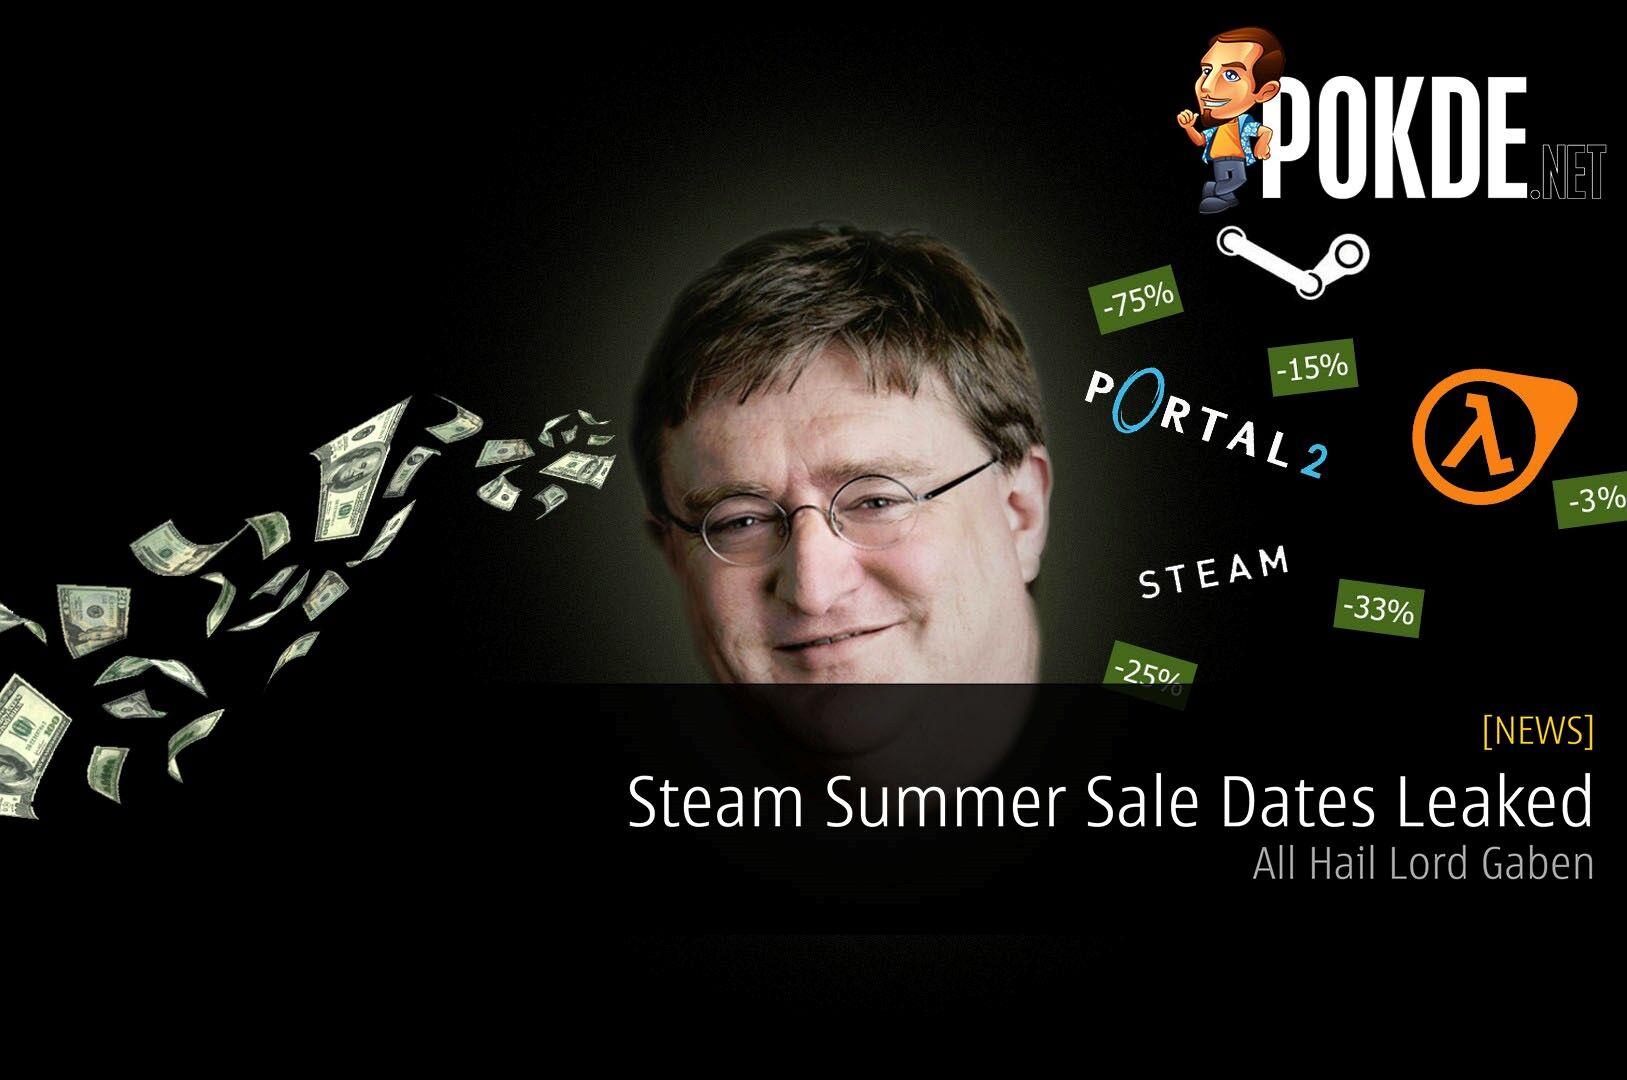 Steam Summer Sale Dates Leaked - All Hail Lord Gaben 28